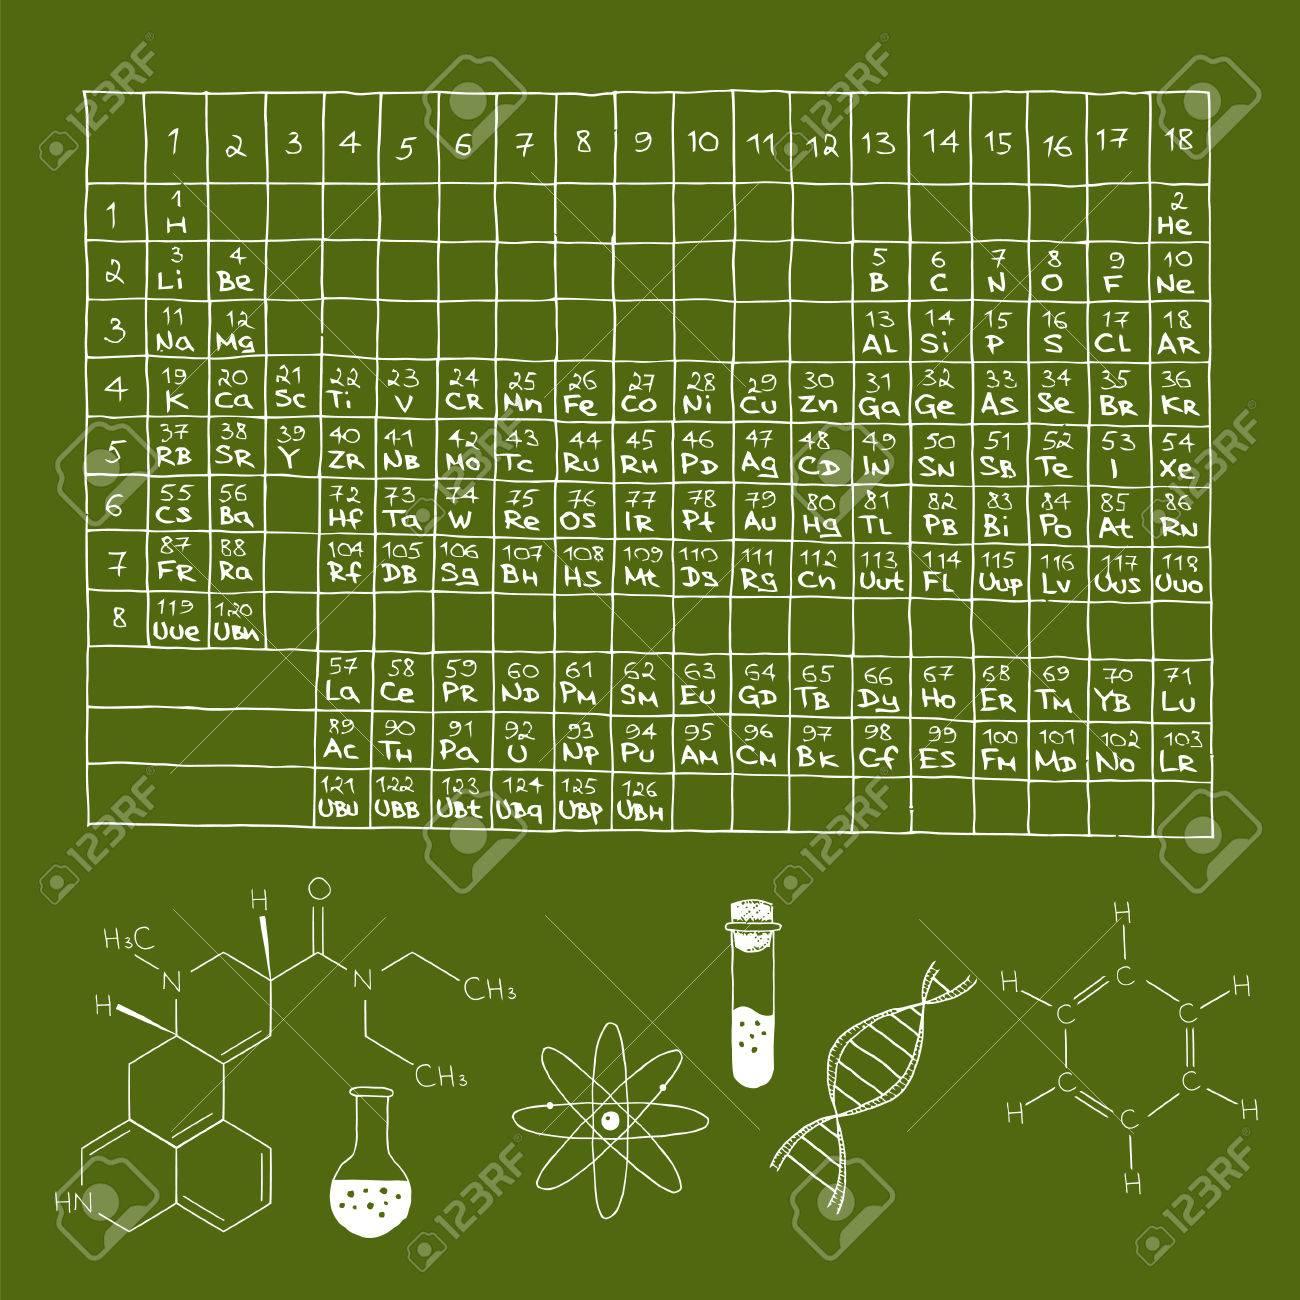 Doodle periodic table of chemical elements formulas retort doodle periodic table of chemical elements formulas retort test tube and other chemical urtaz Choice Image